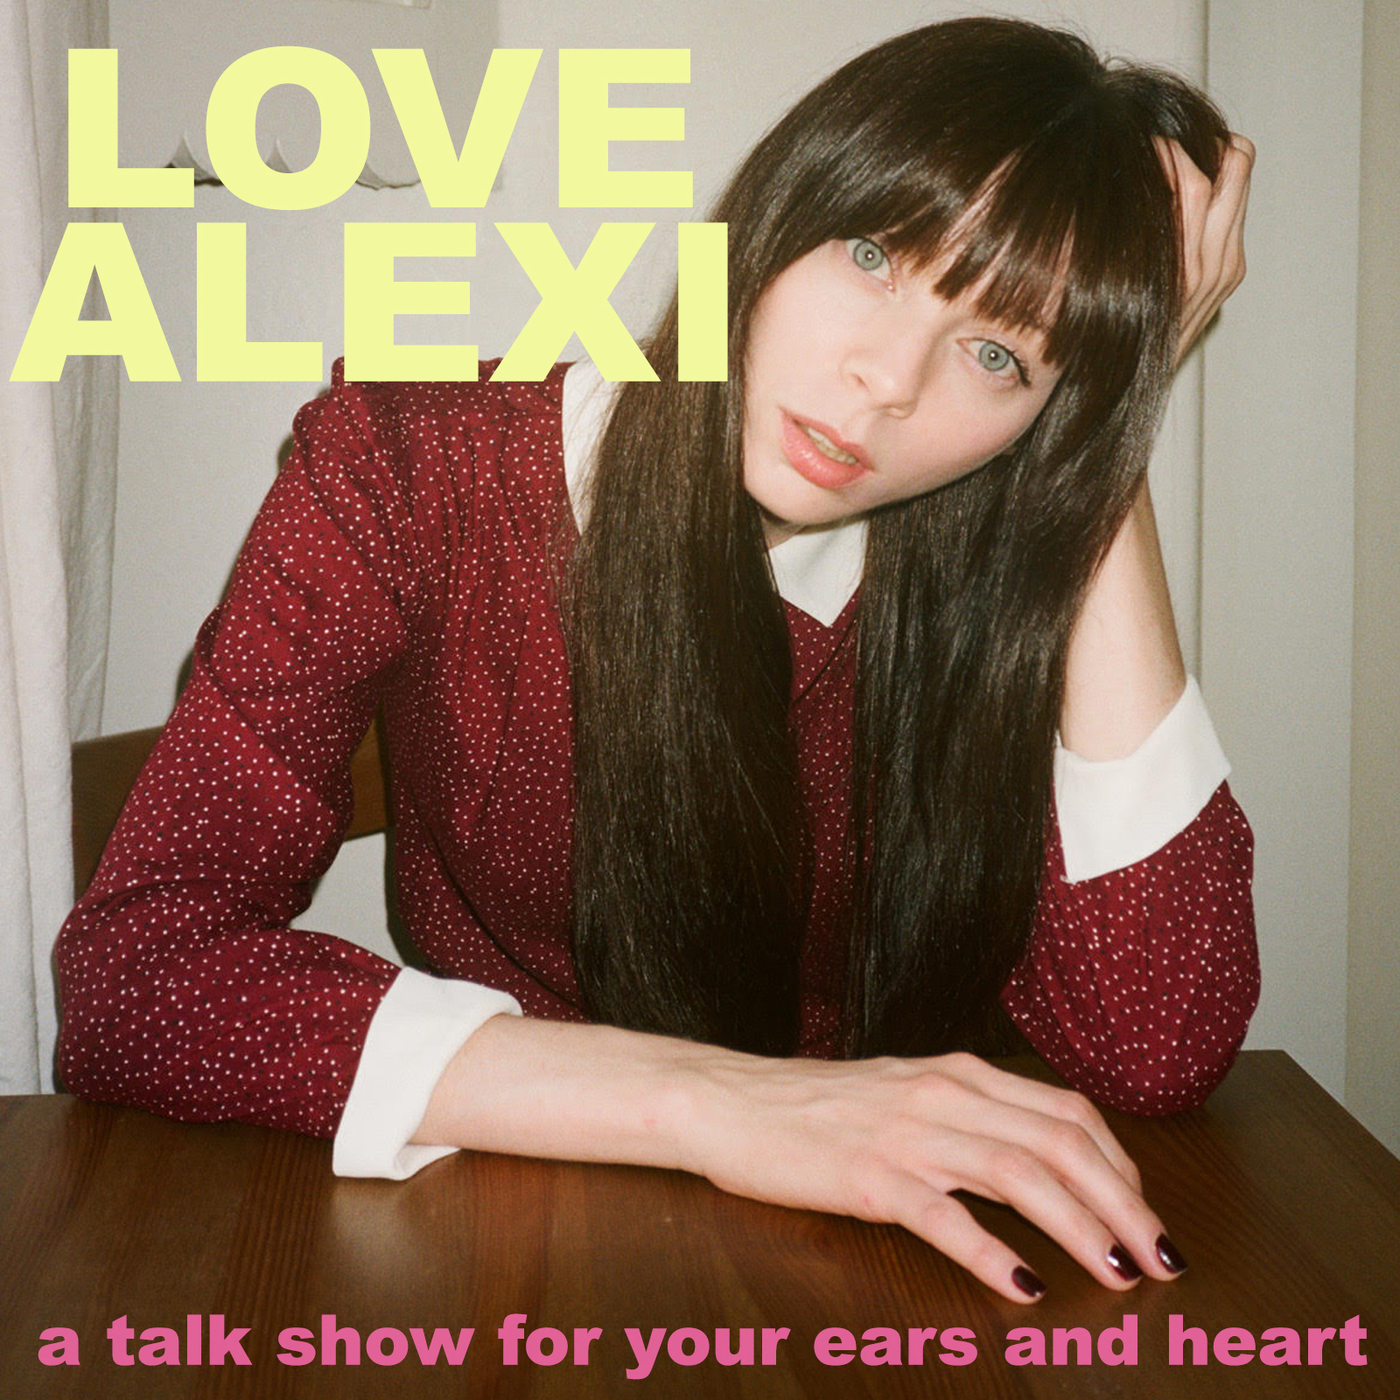 14_LOVE_ALEXI